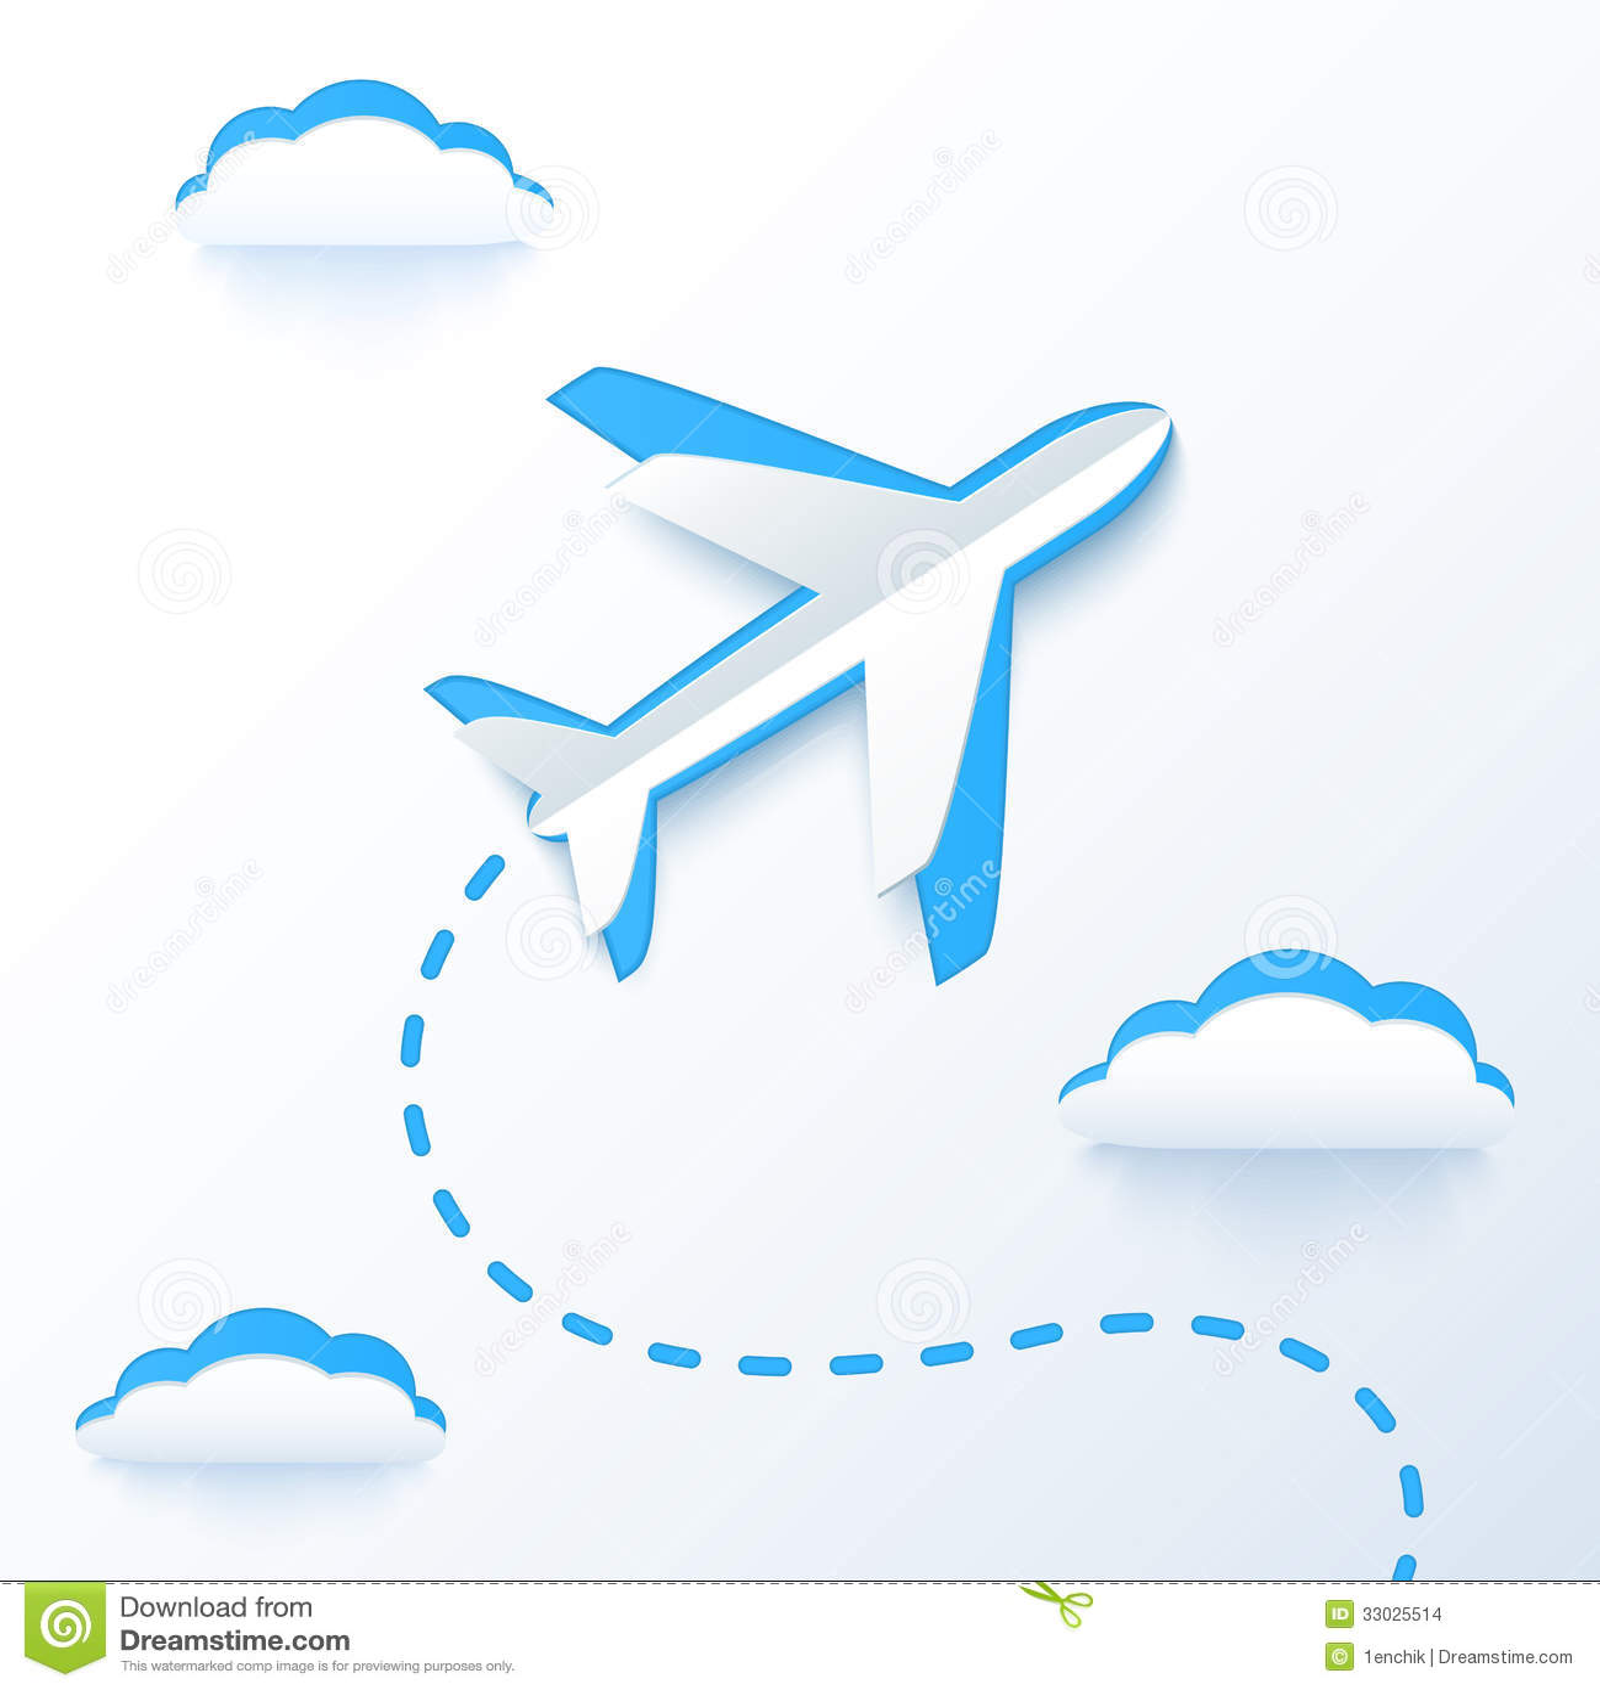 paper plane stock illustration - photo #48